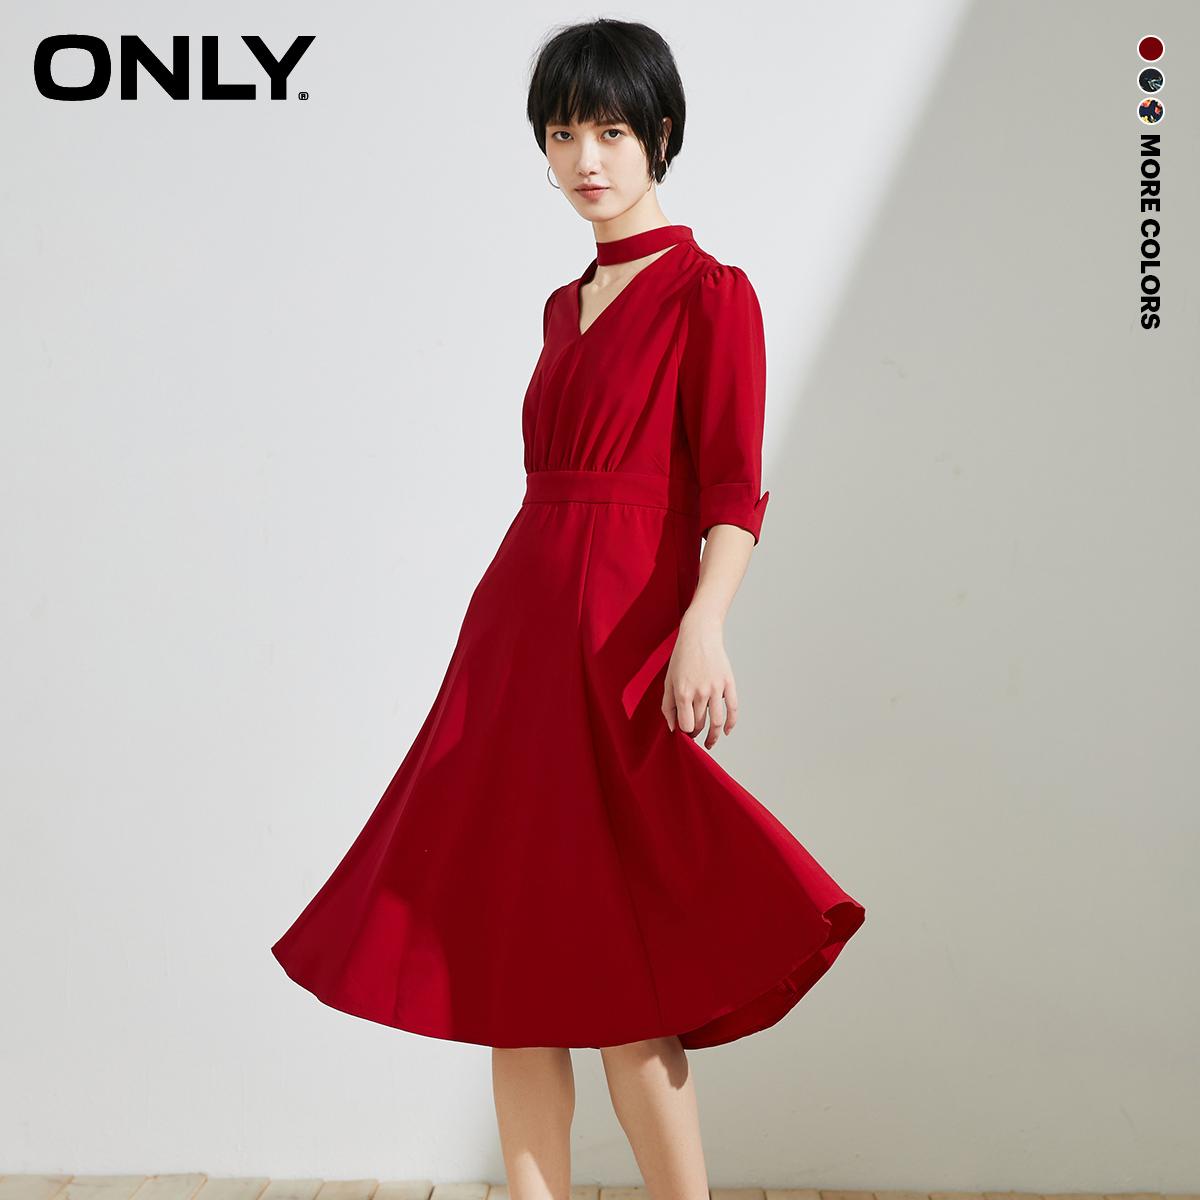 ONLY2020夏季新款淑女收腰A字五分袖中长款连衣裙女|120107709